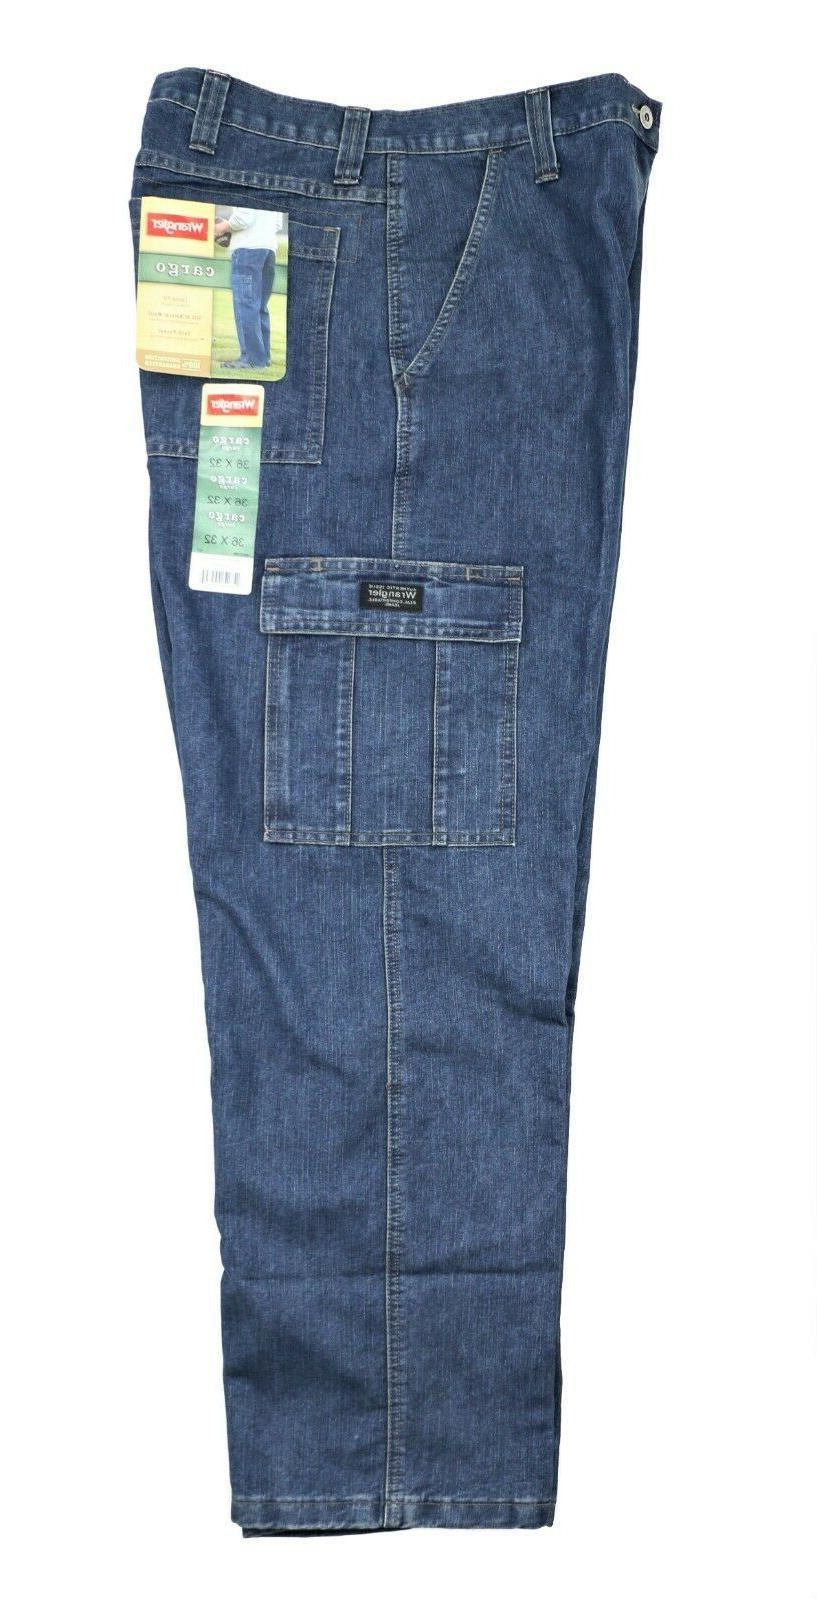 New Wrangler Jeans Dark Denim Pocket Men's